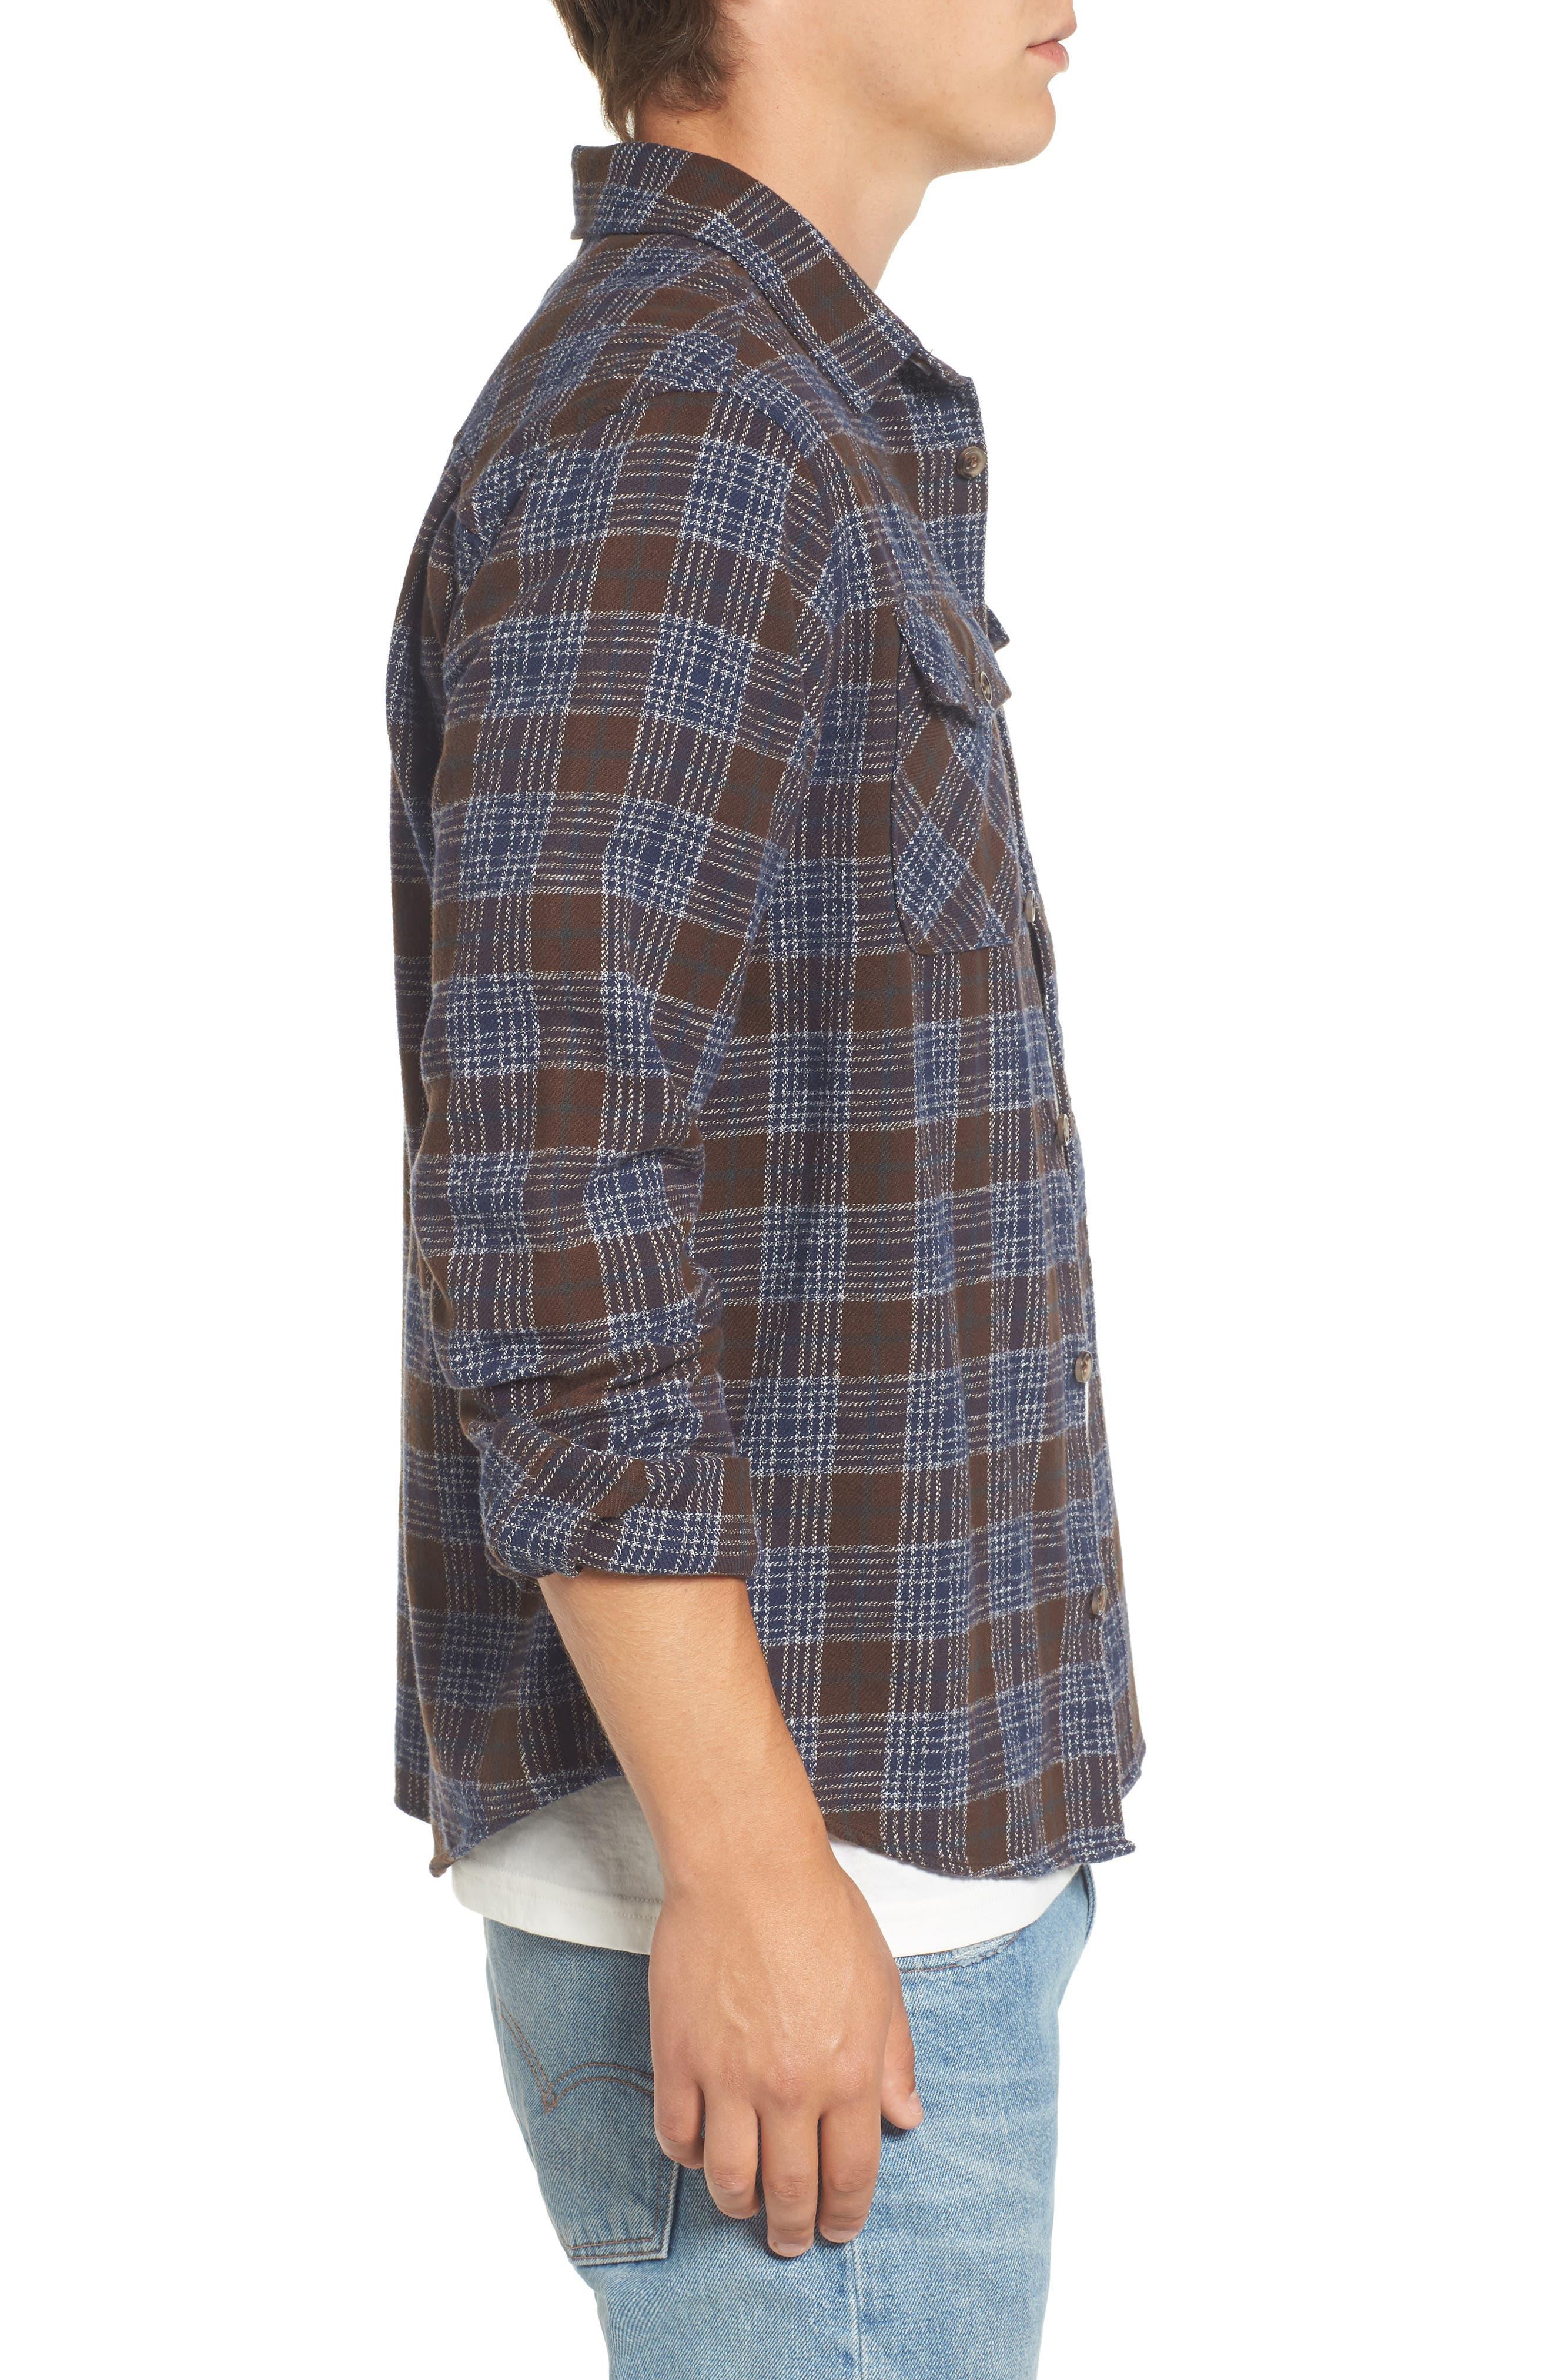 'That'll Work' Trim Fit Plaid Flannel Shirt,                             Alternate thumbnail 21, color,